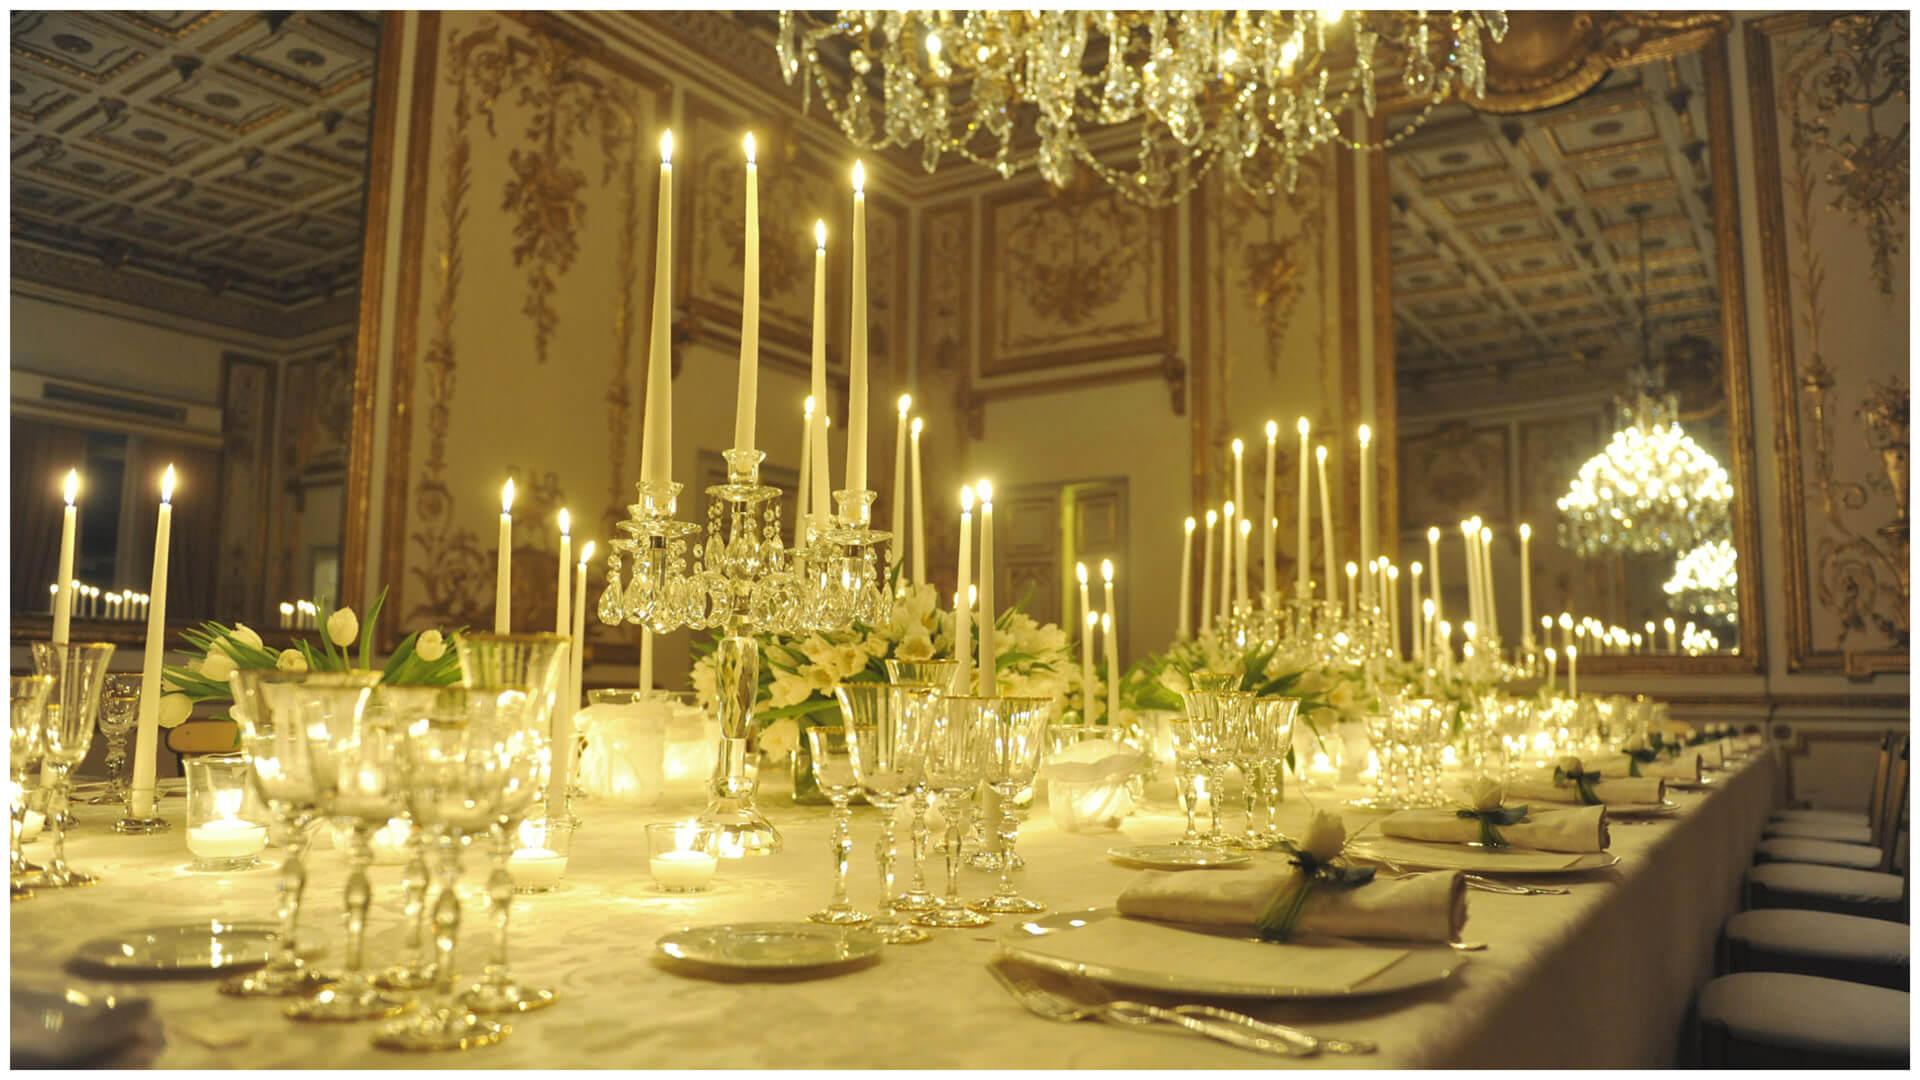 palazzo_gianfigliazzi_fiorile_firenze_1